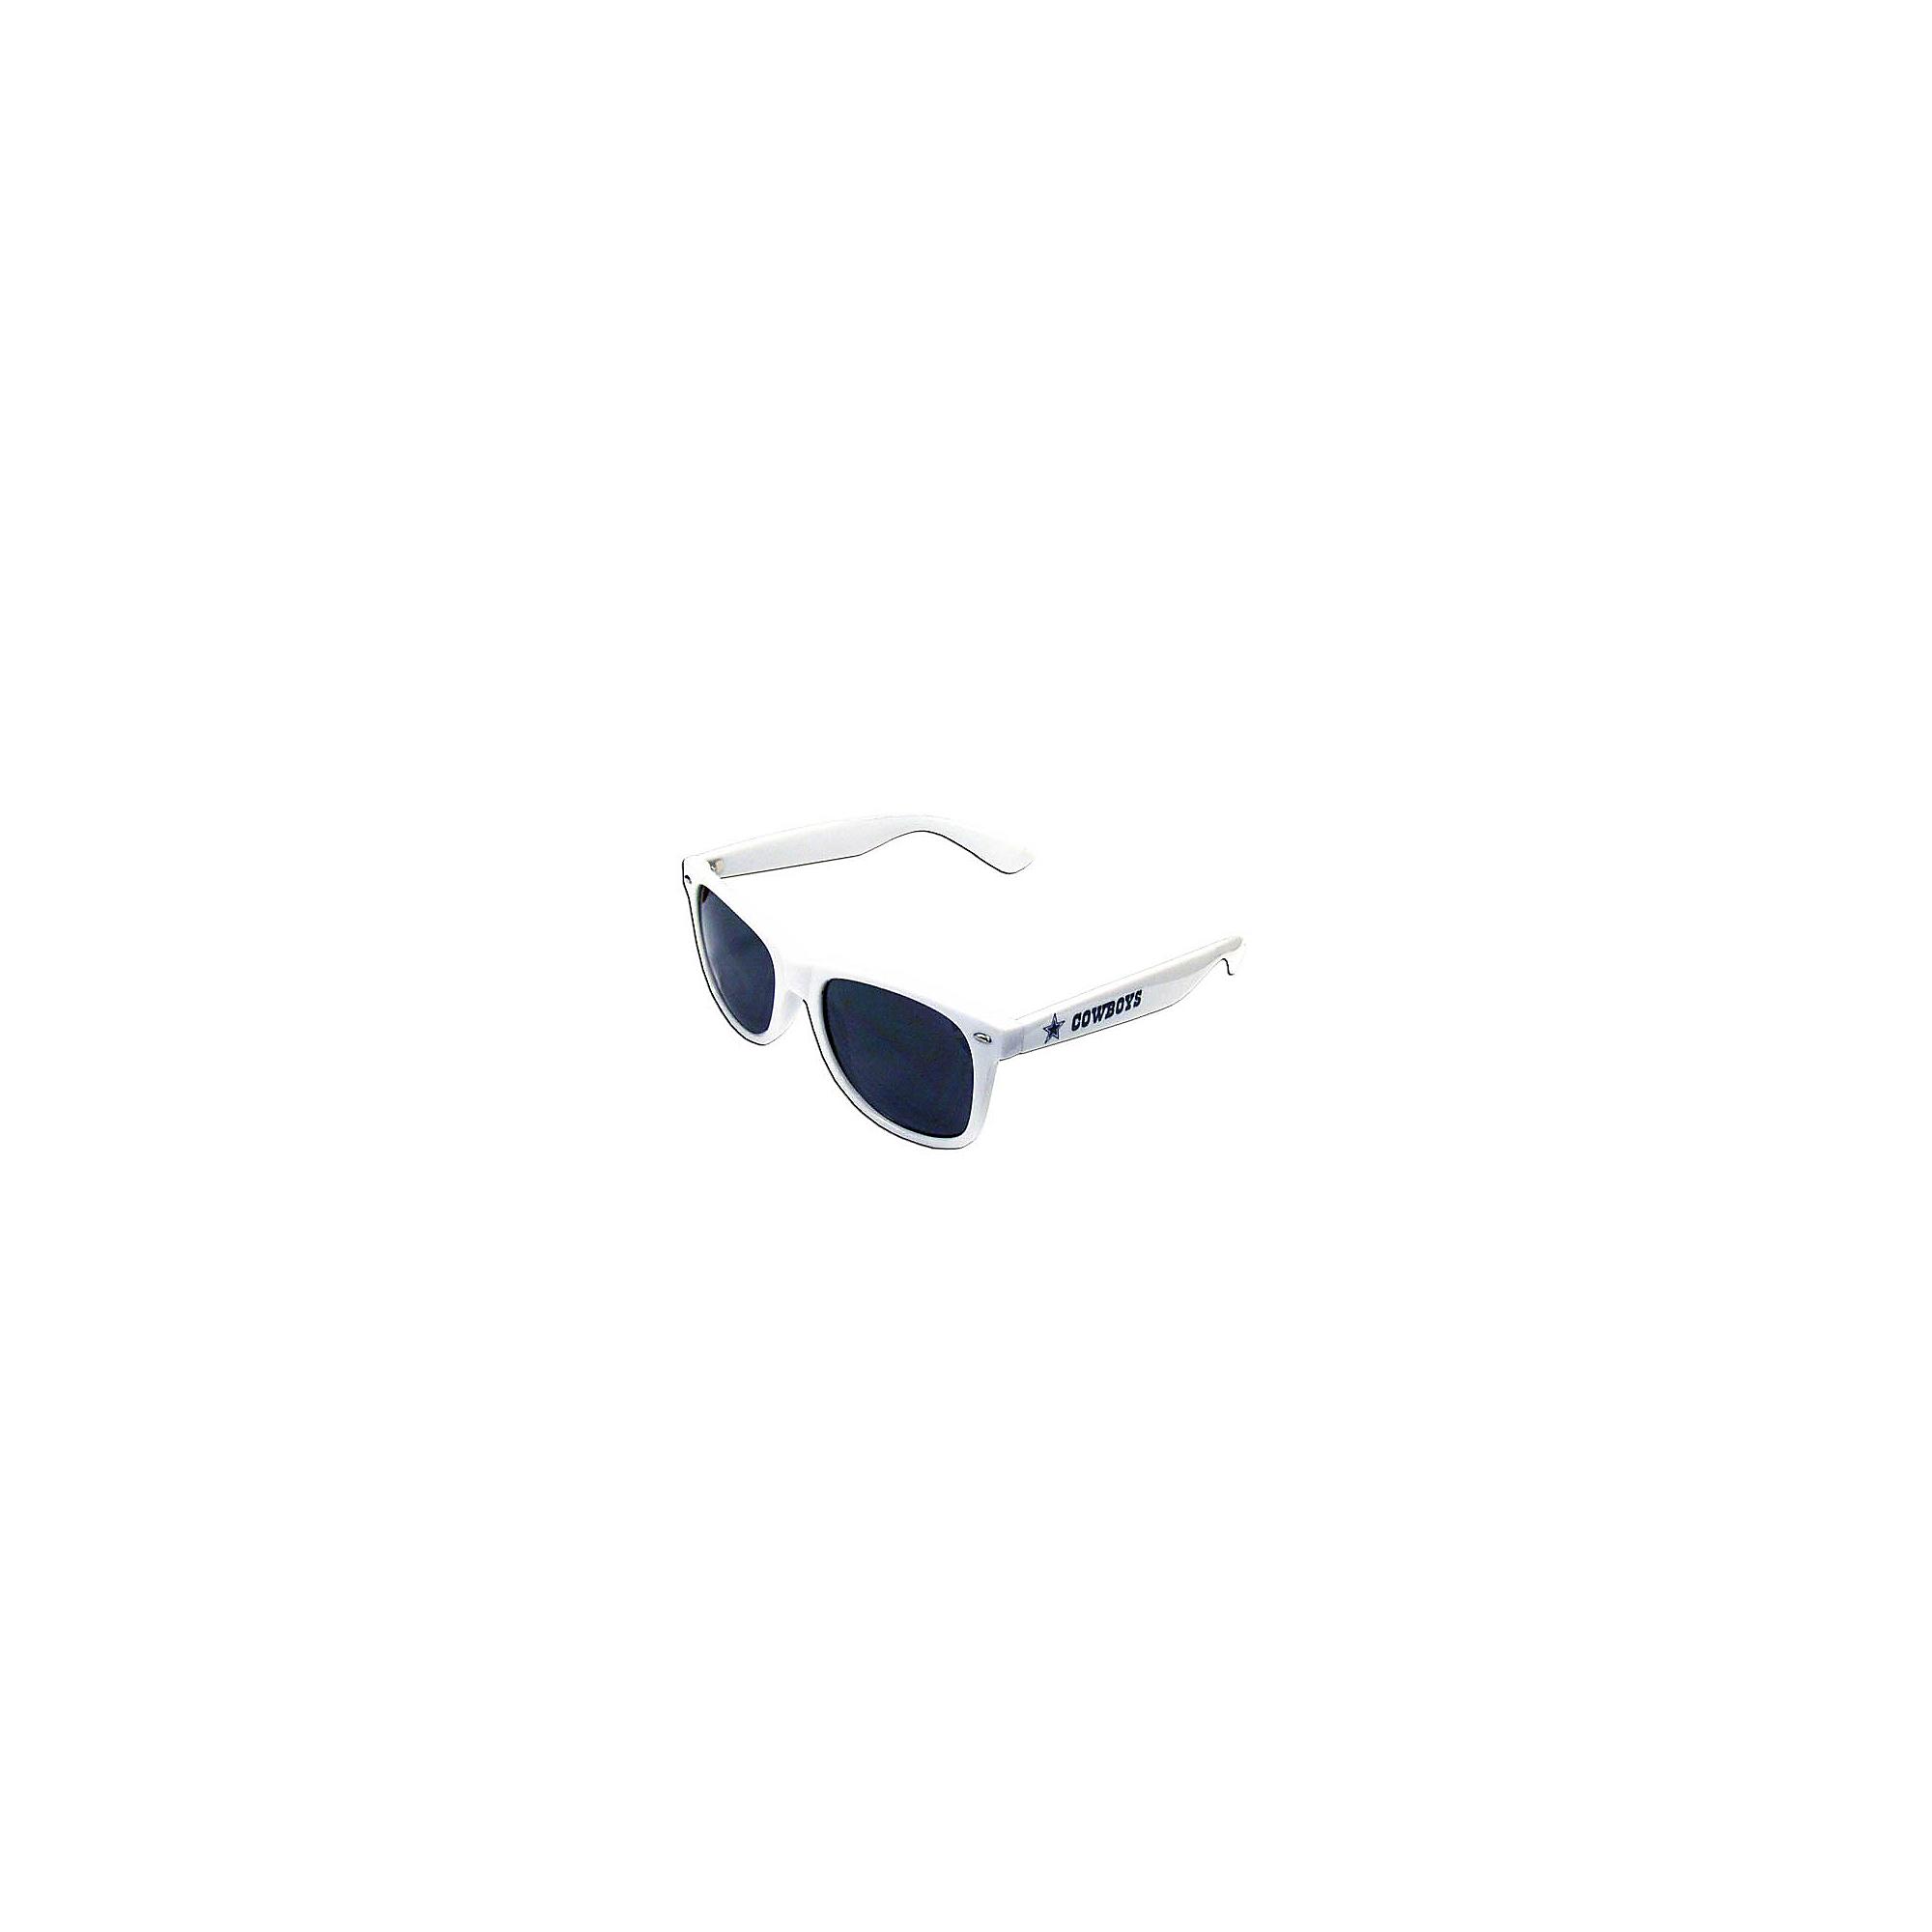 Dallas Cowboys White Beachfarer Sunglasses